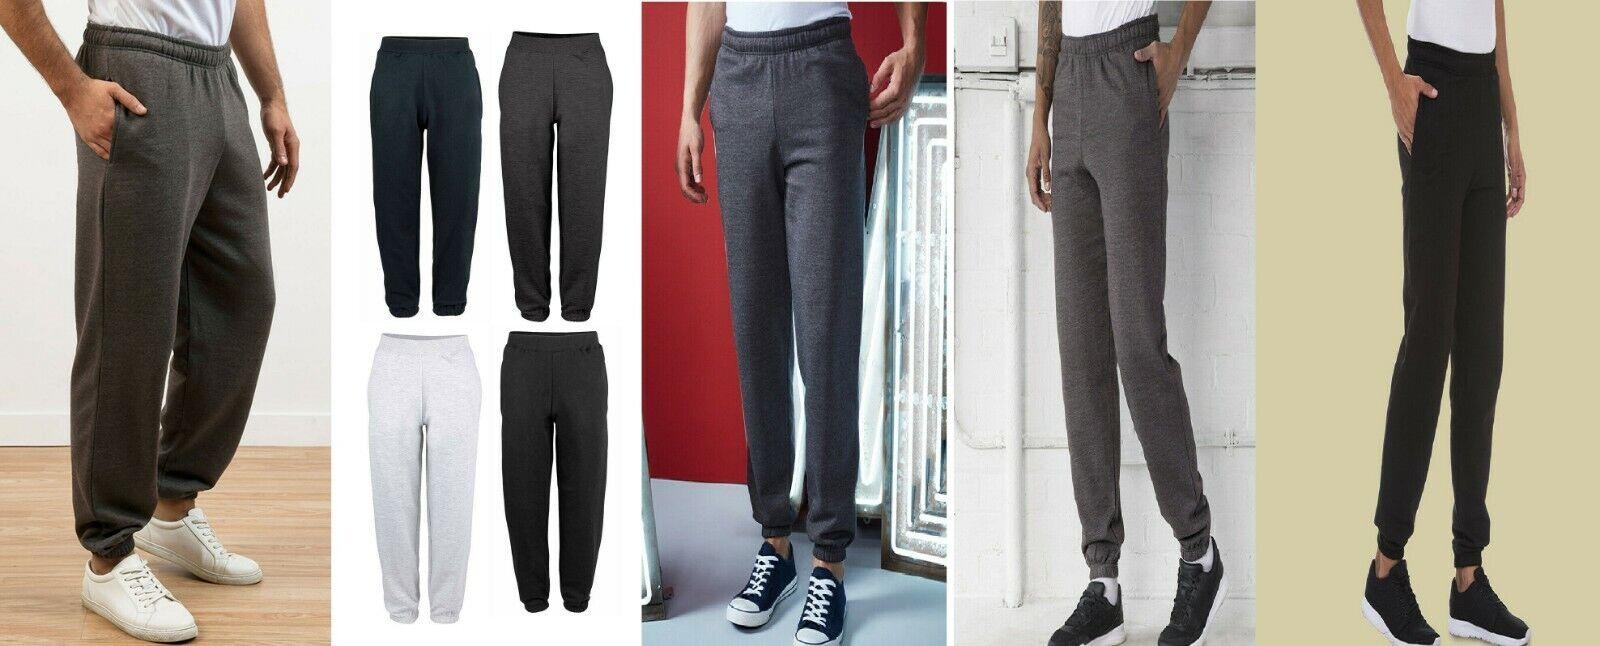 AWDis Mens College Cuffed Jog Pants Sports Running Jogging Bottom Sweatpants New